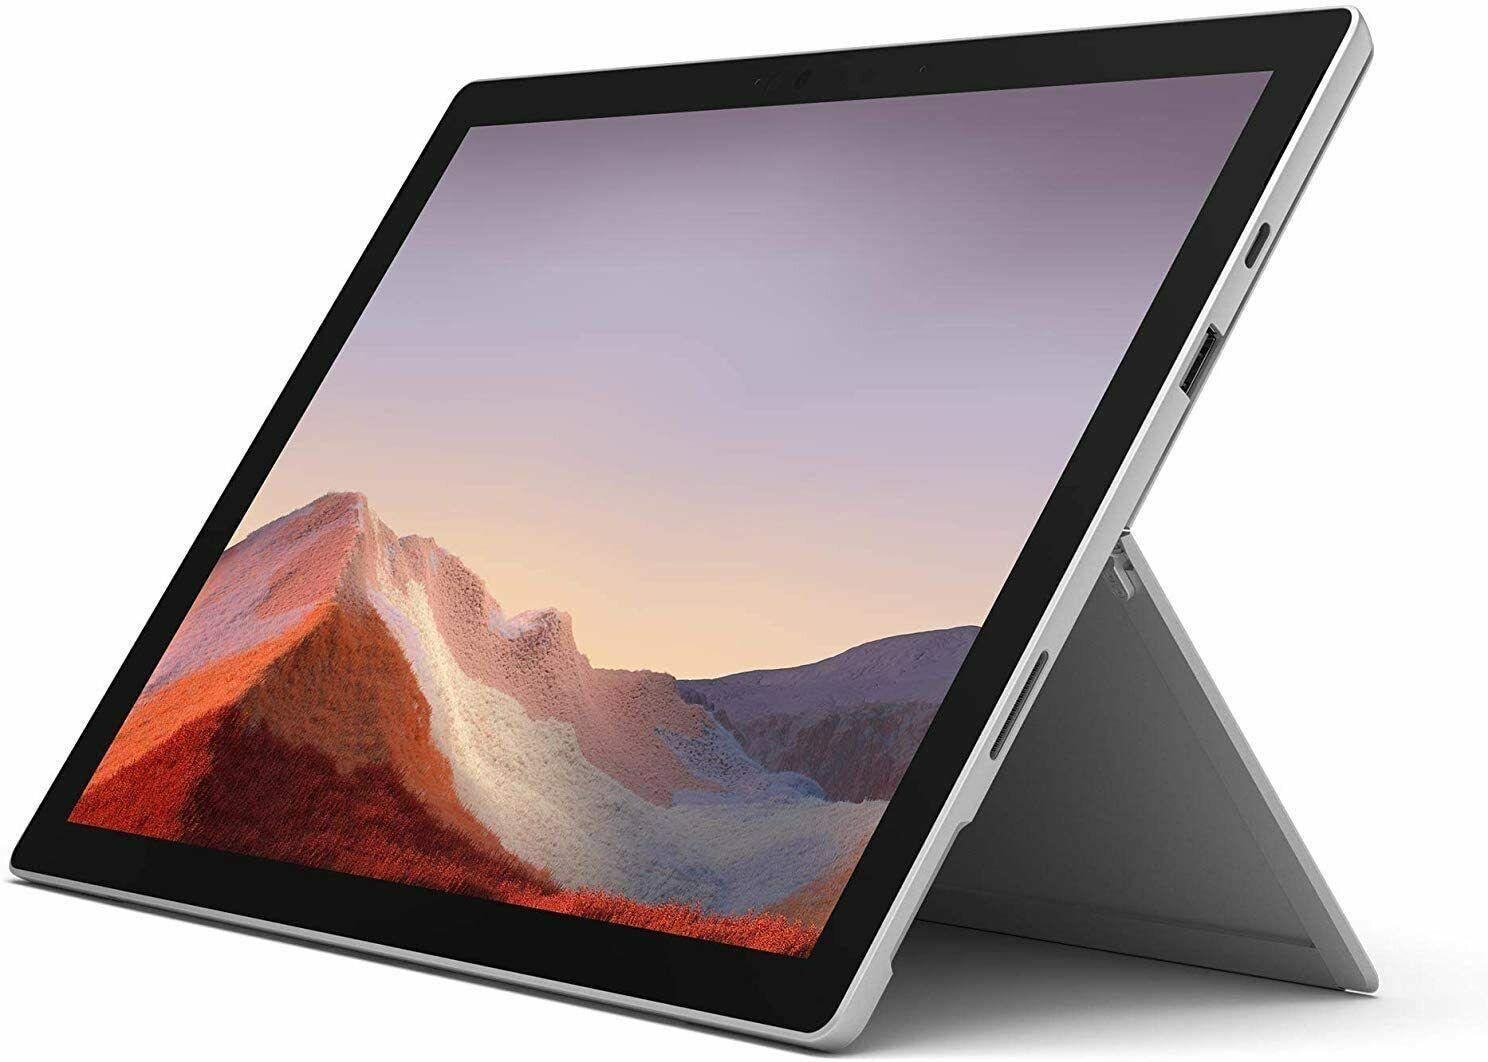 Bild zu 12,3 Zoll Tablet Microsoft Surface Pro 7 (Intel Core i5, 8GB RAM, 256GB) für 799€ (Vergleich: 949€)